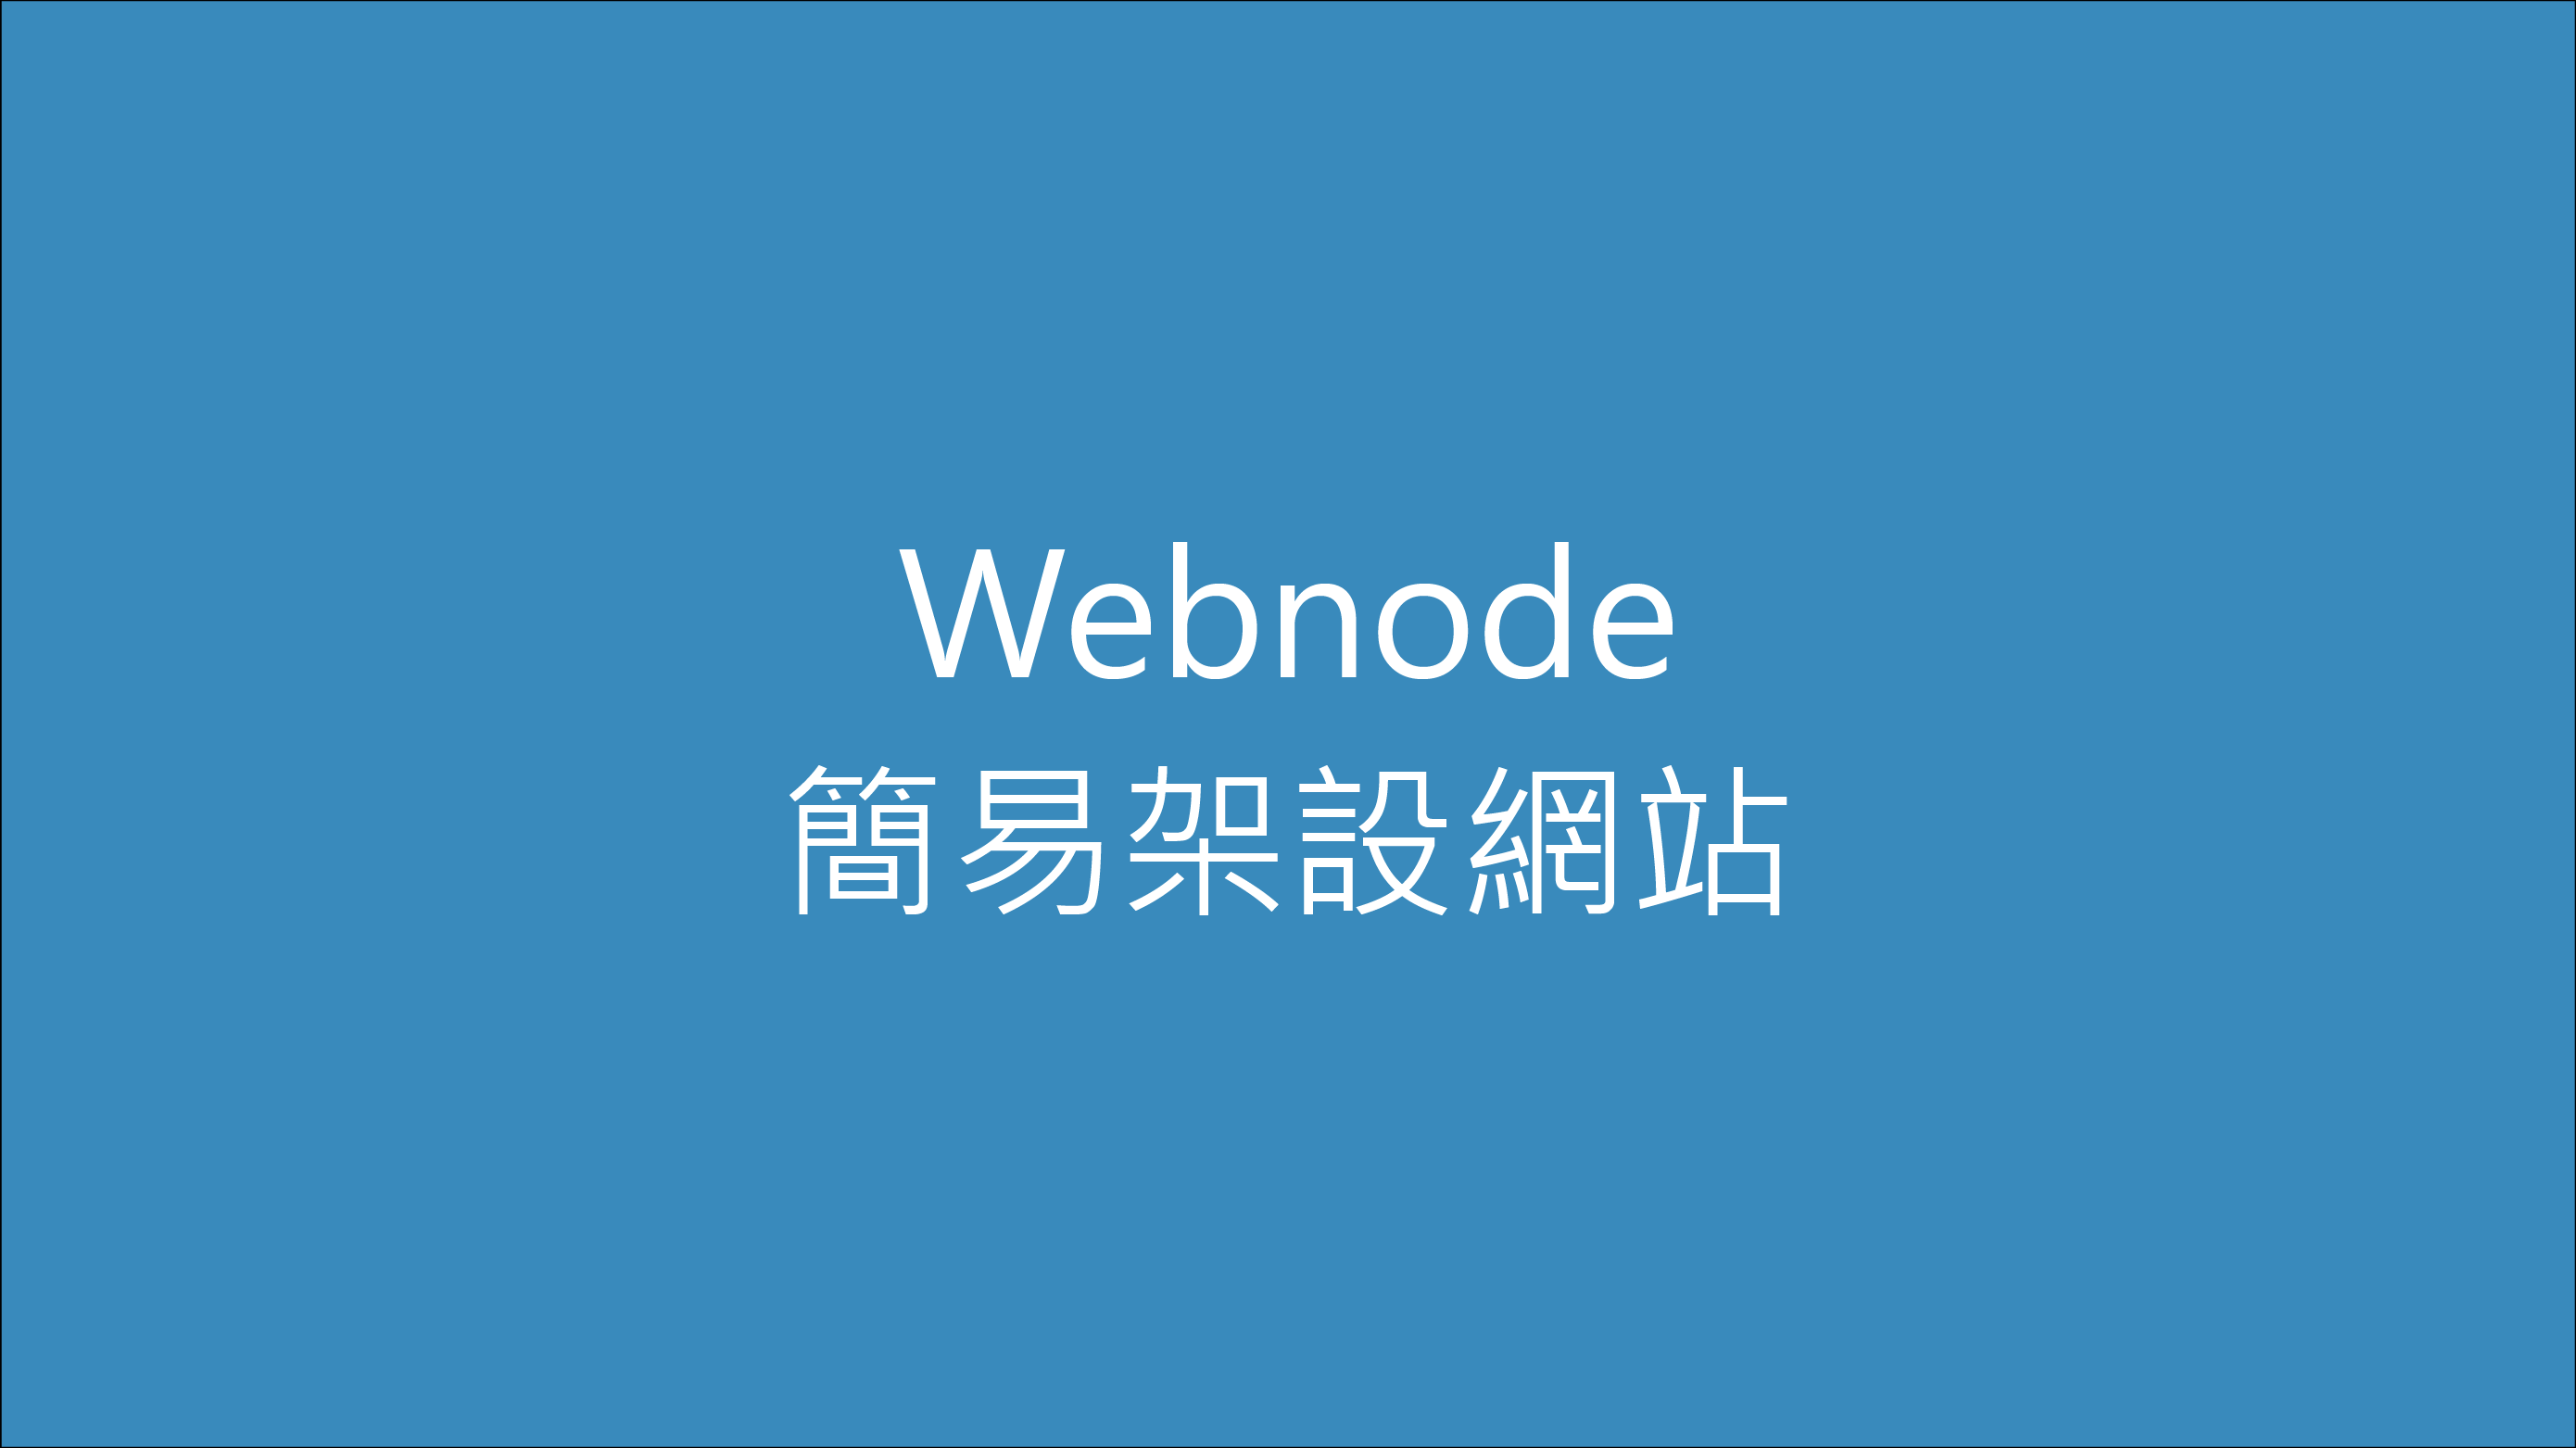 Webnode簡易架設網站